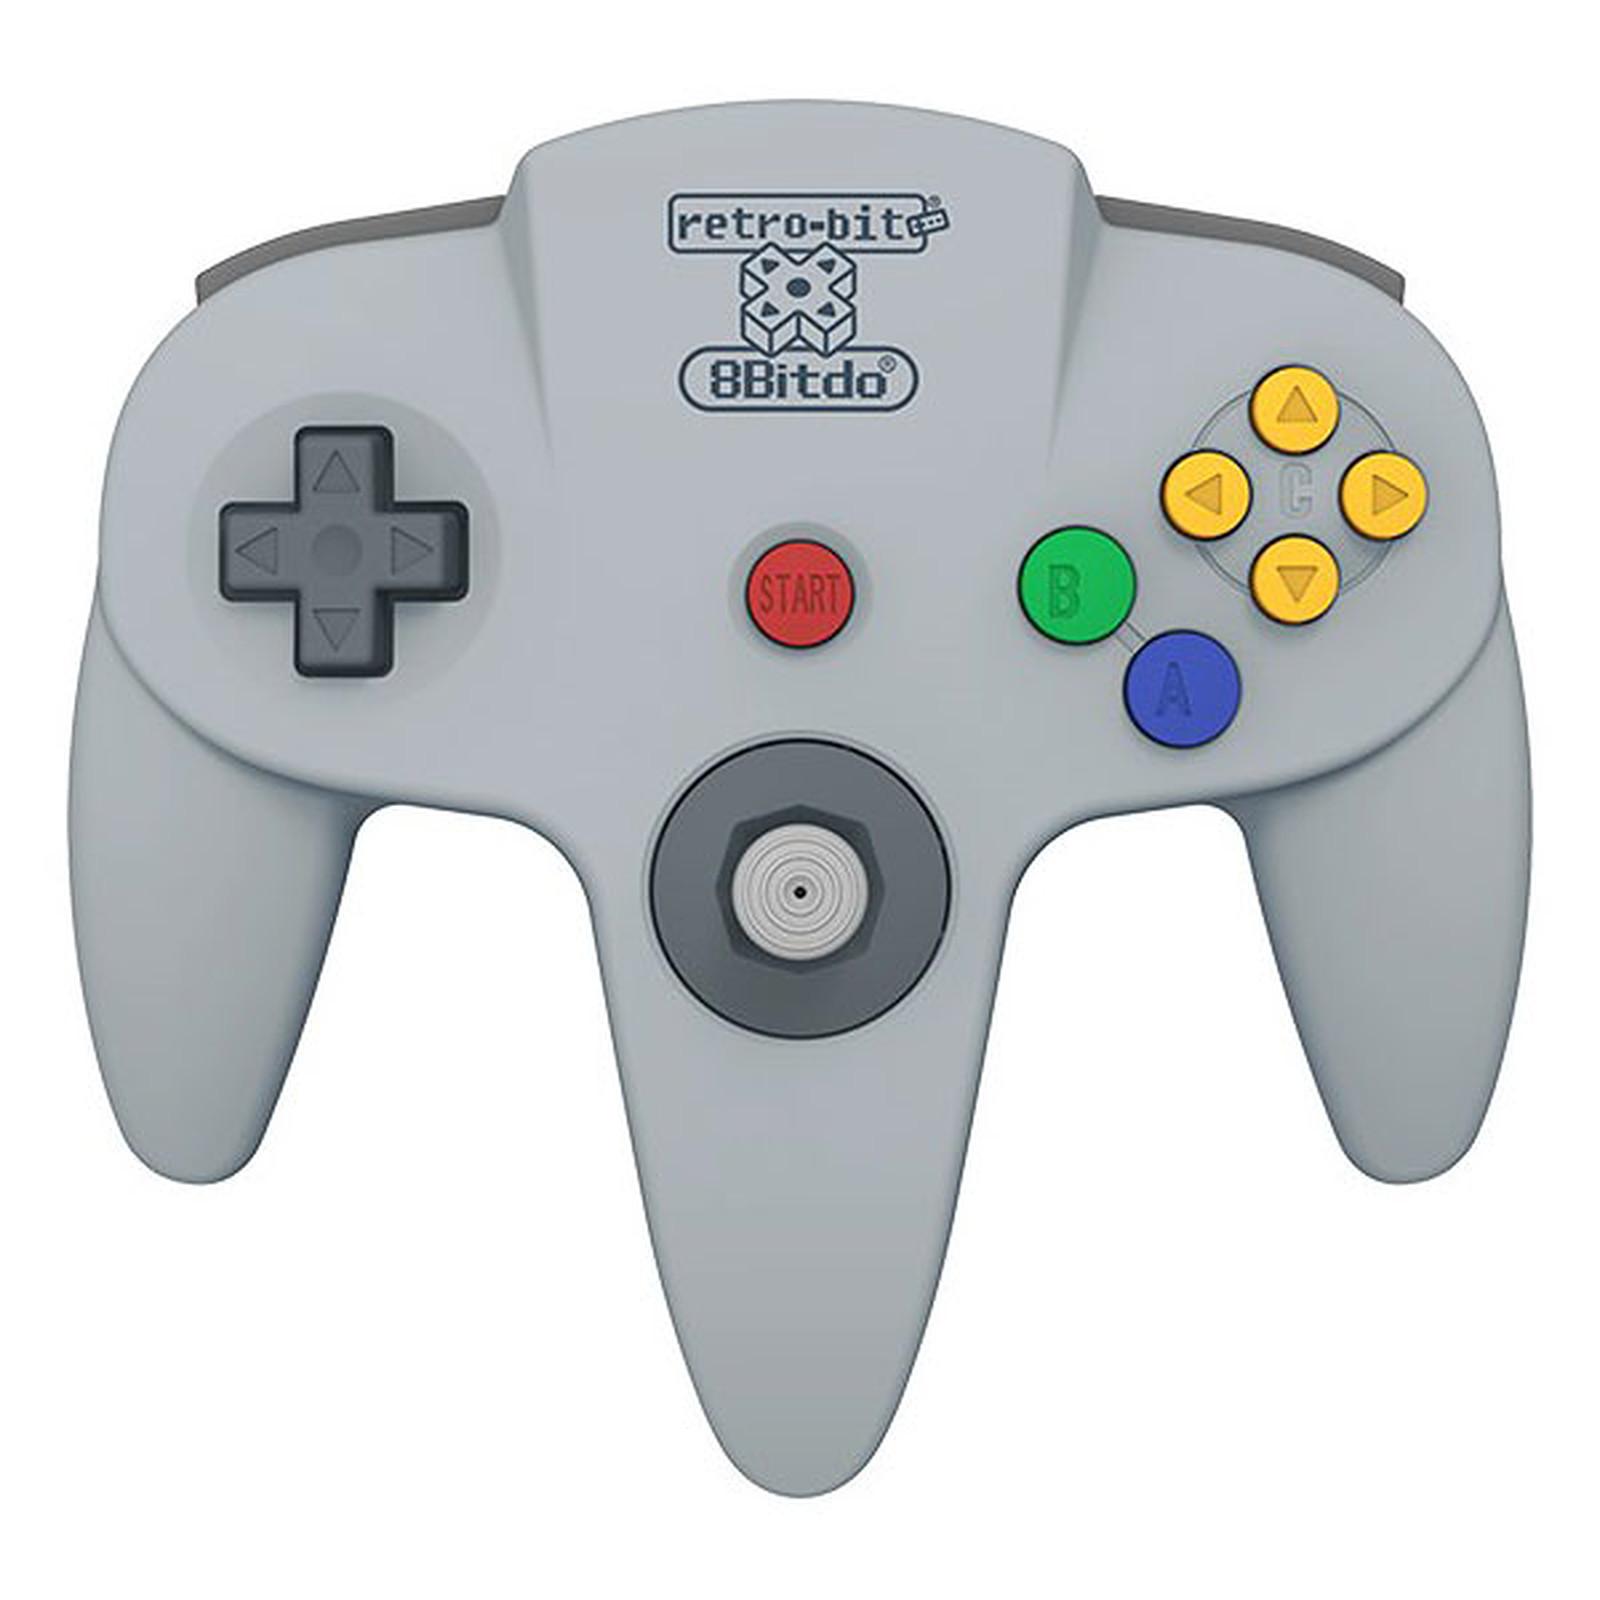 8Bitdo Retrobit N64